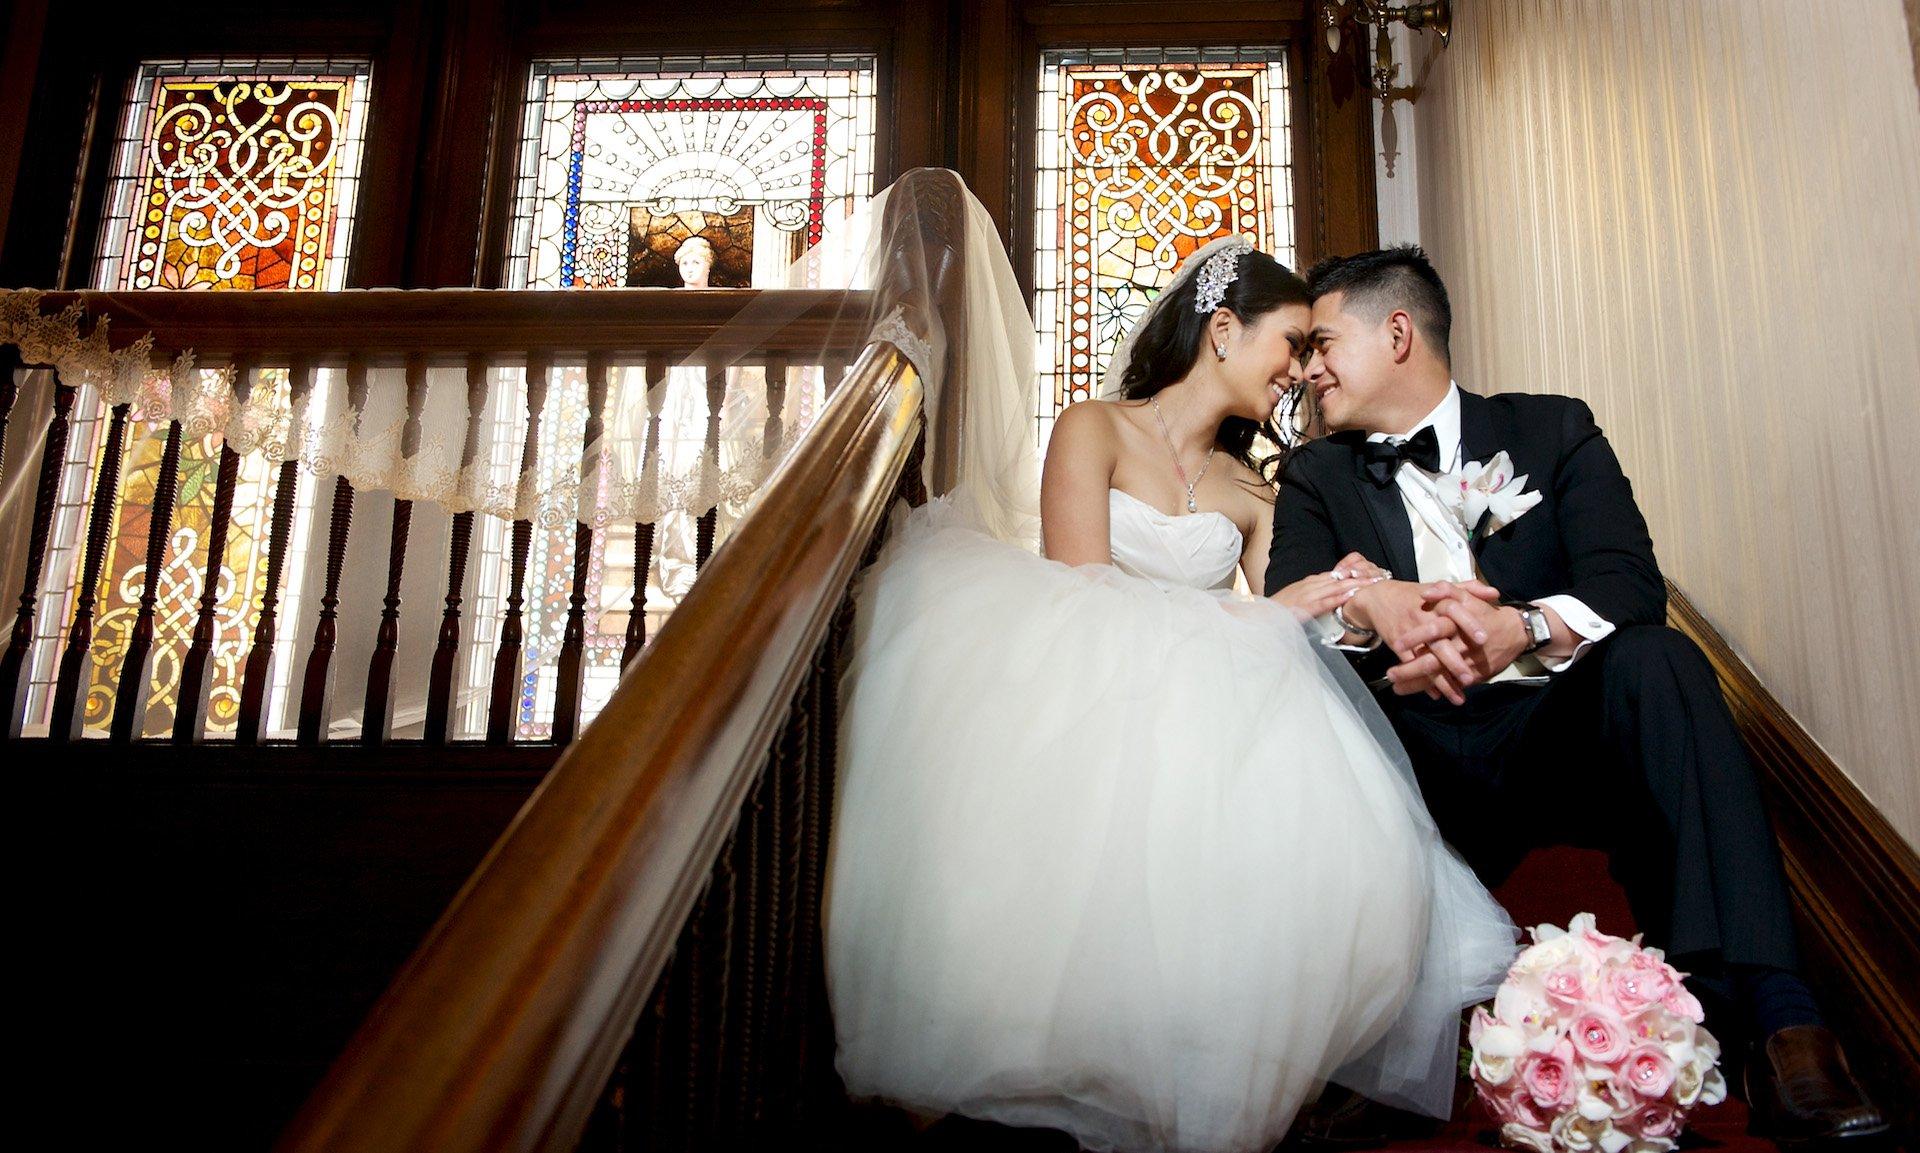 Wedding photos at the Scottish Rite